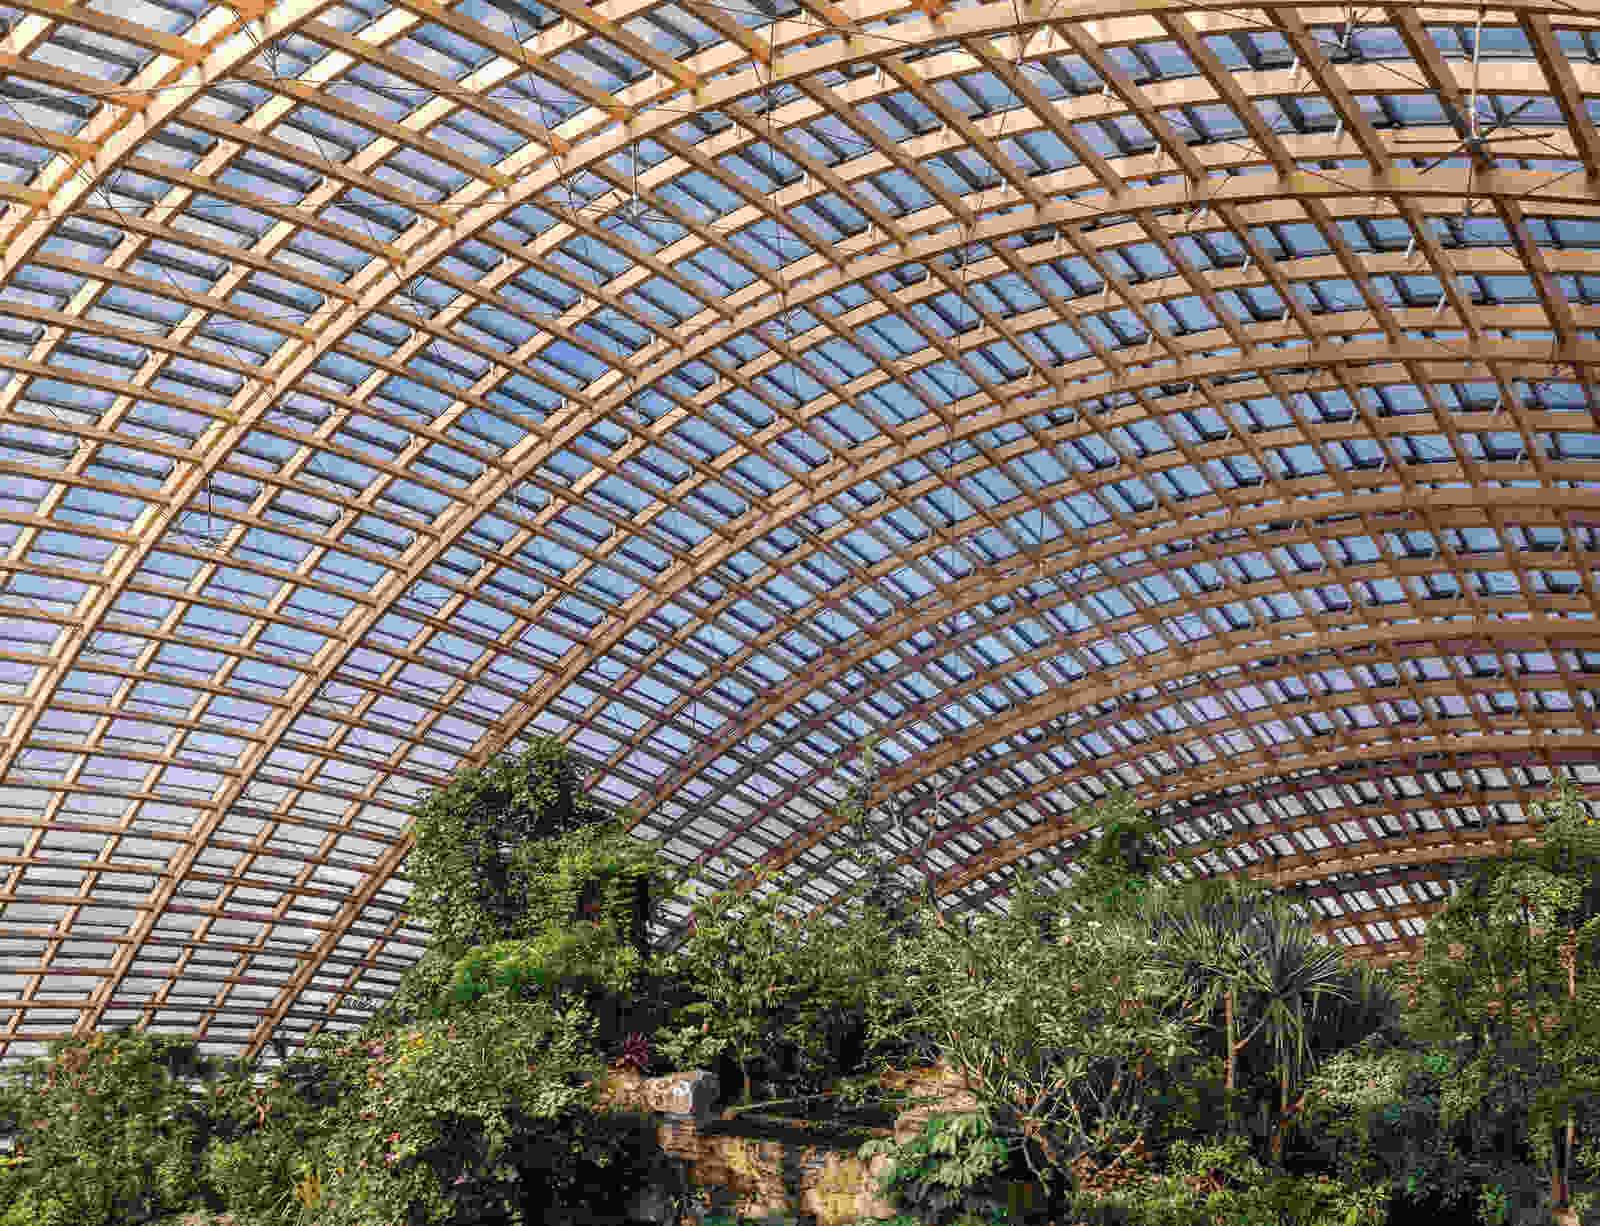 338 dmaa Taiyuan Botanical Garden 02 greenhouse 0871a Pano Creat AR